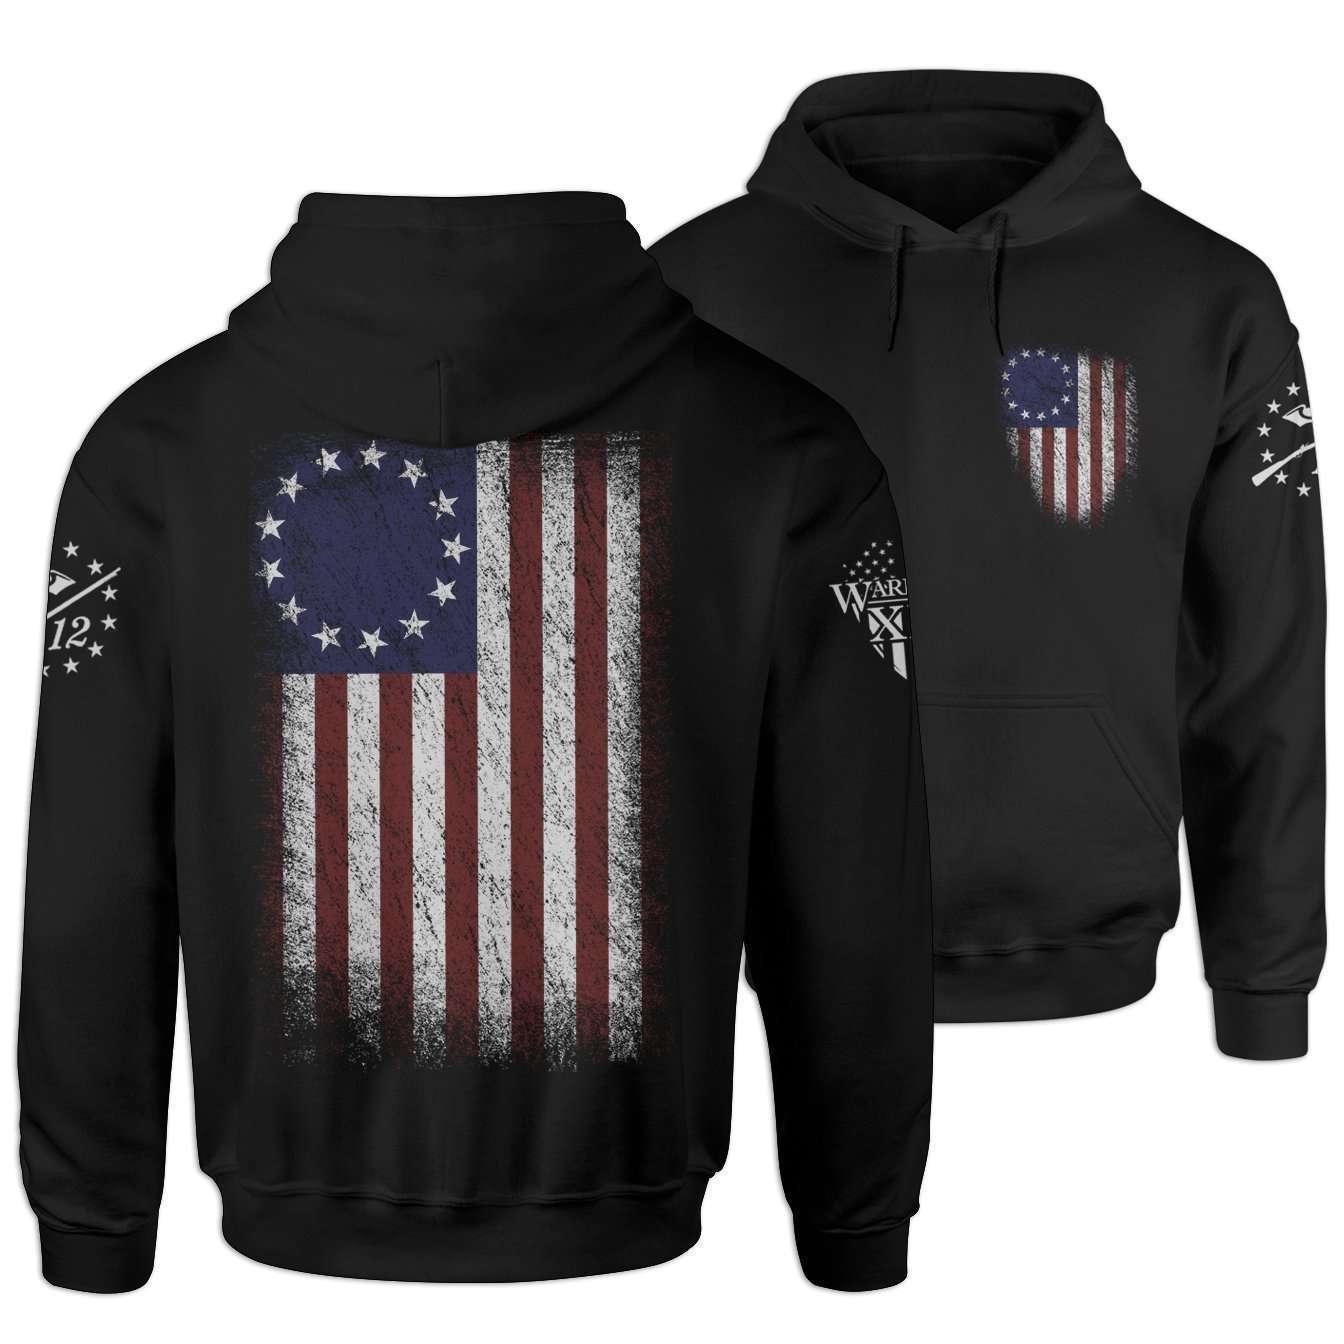 Betsy Ross Flag Hoodie